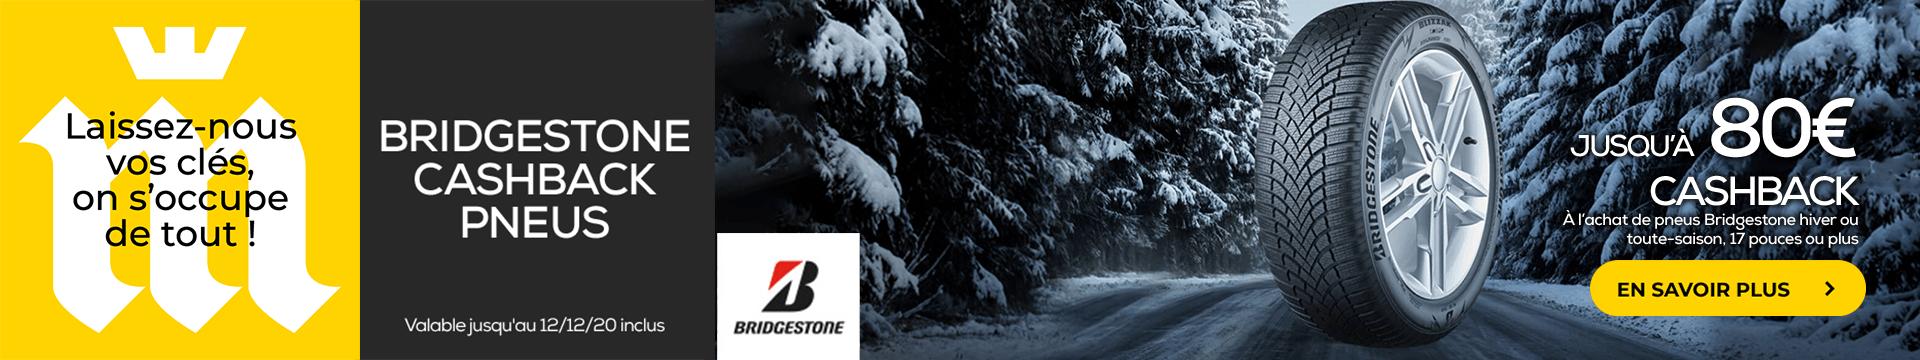 Cashback Pneus Bridgestone